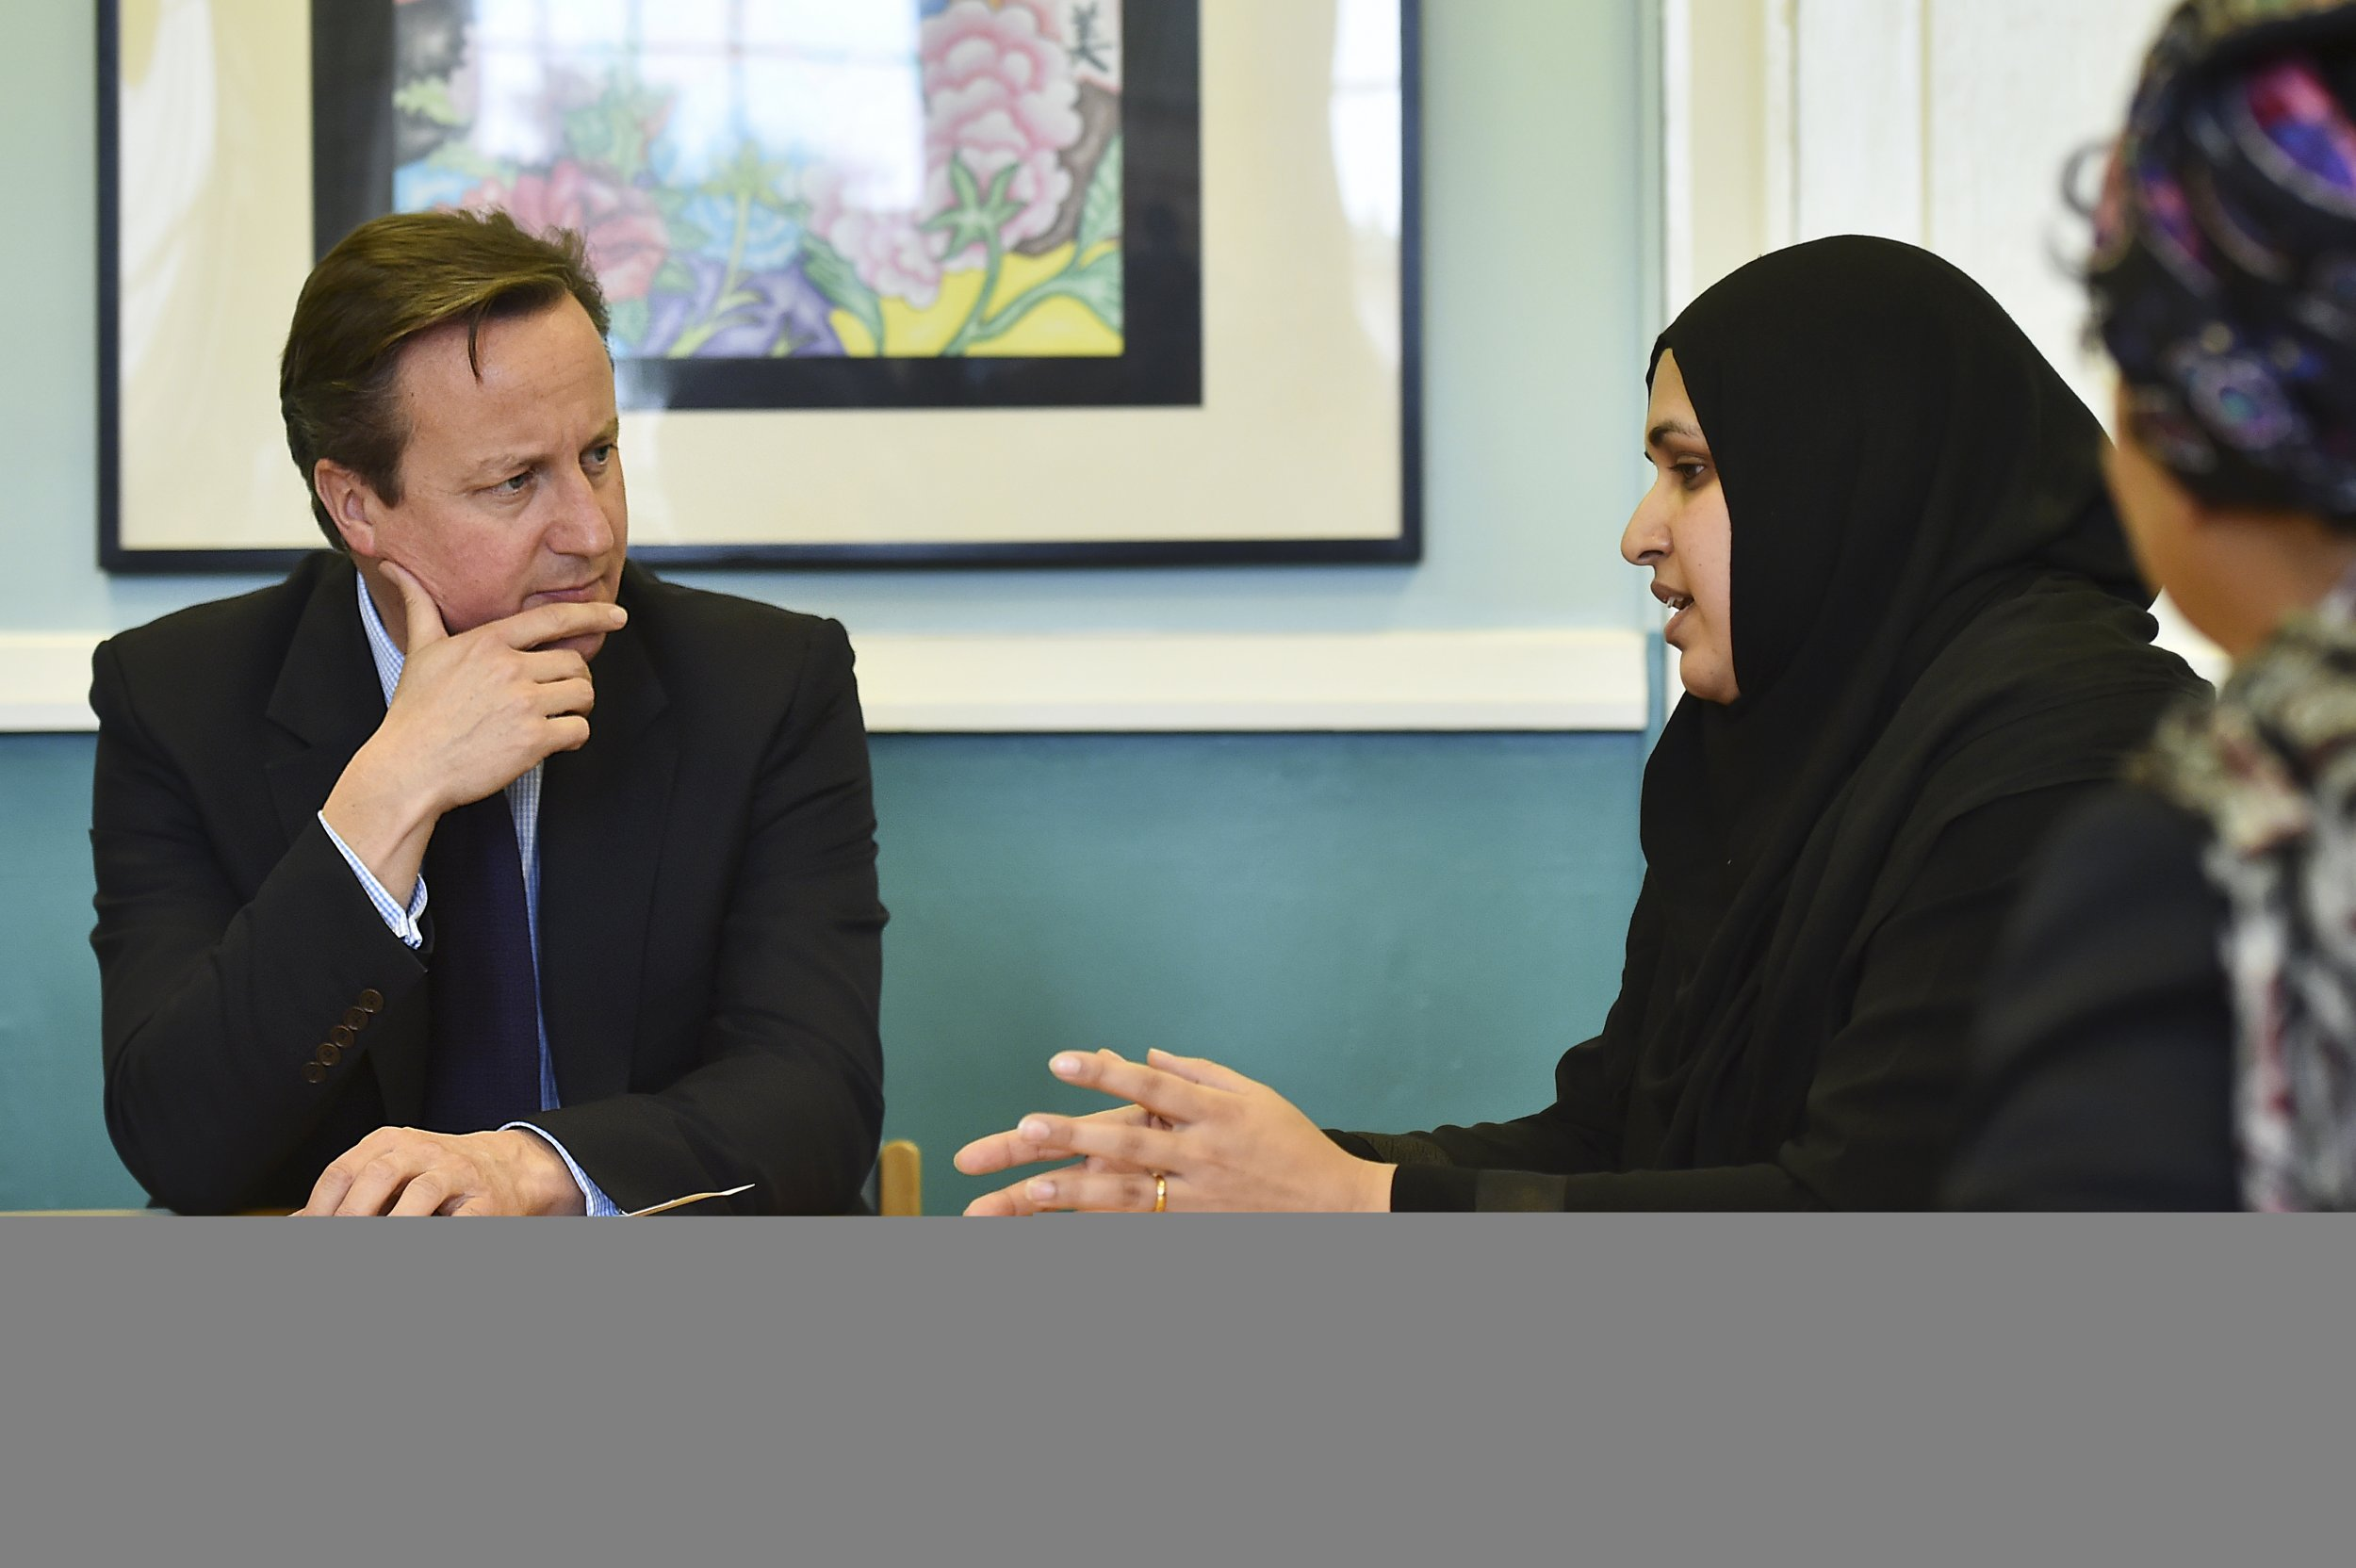 Muslim women meeting with David Cameron